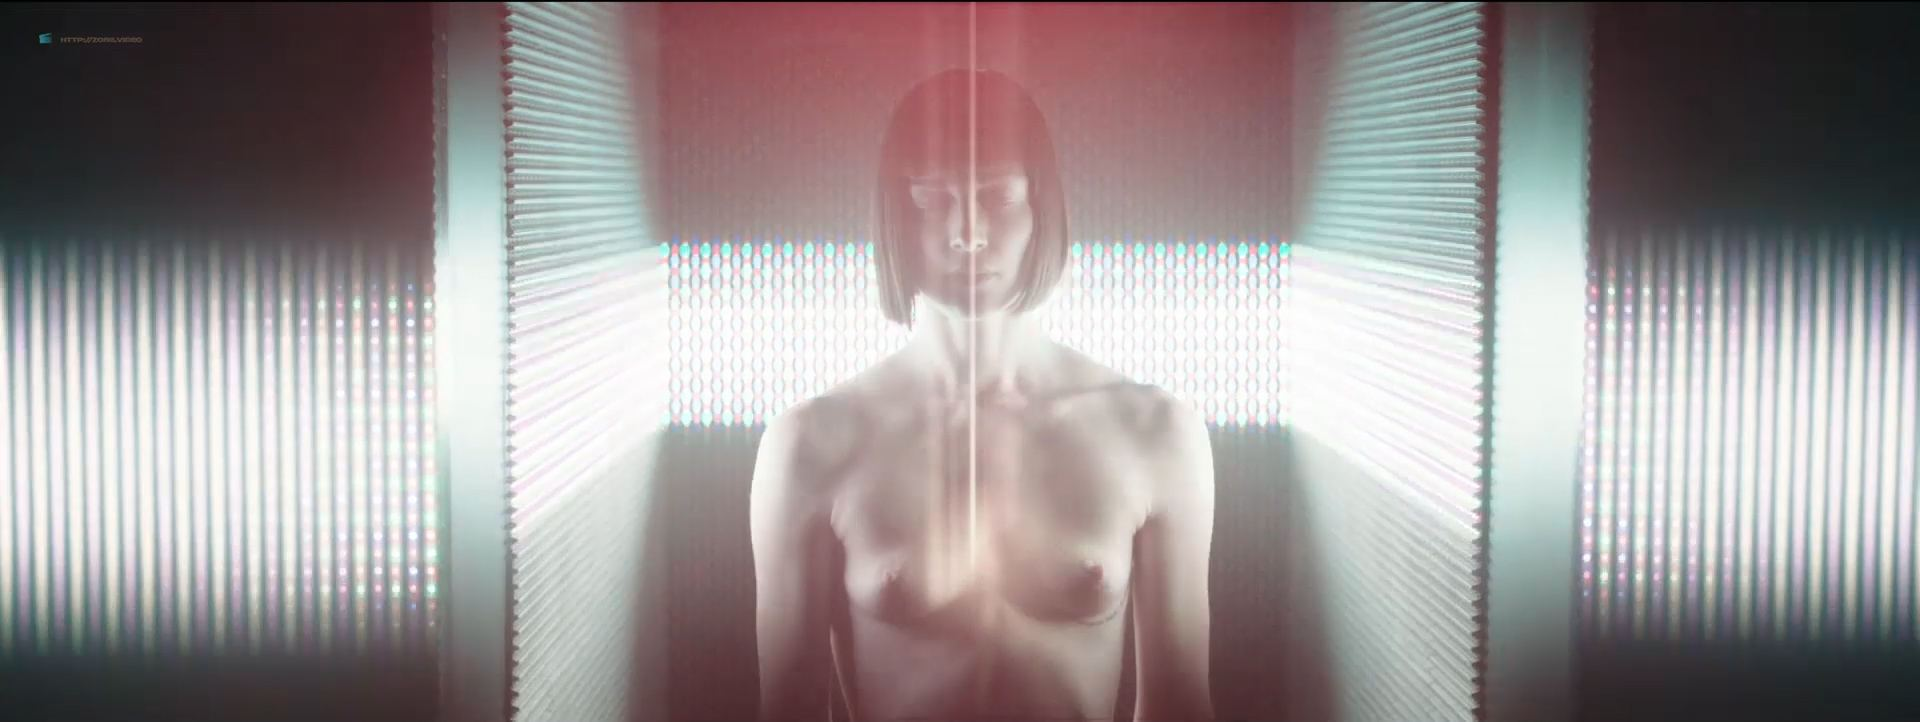 0213032347036_04_Stoya-nude-full-frontal-A.I.-Rising-RS-2018-HD-1080p-0014.jpg